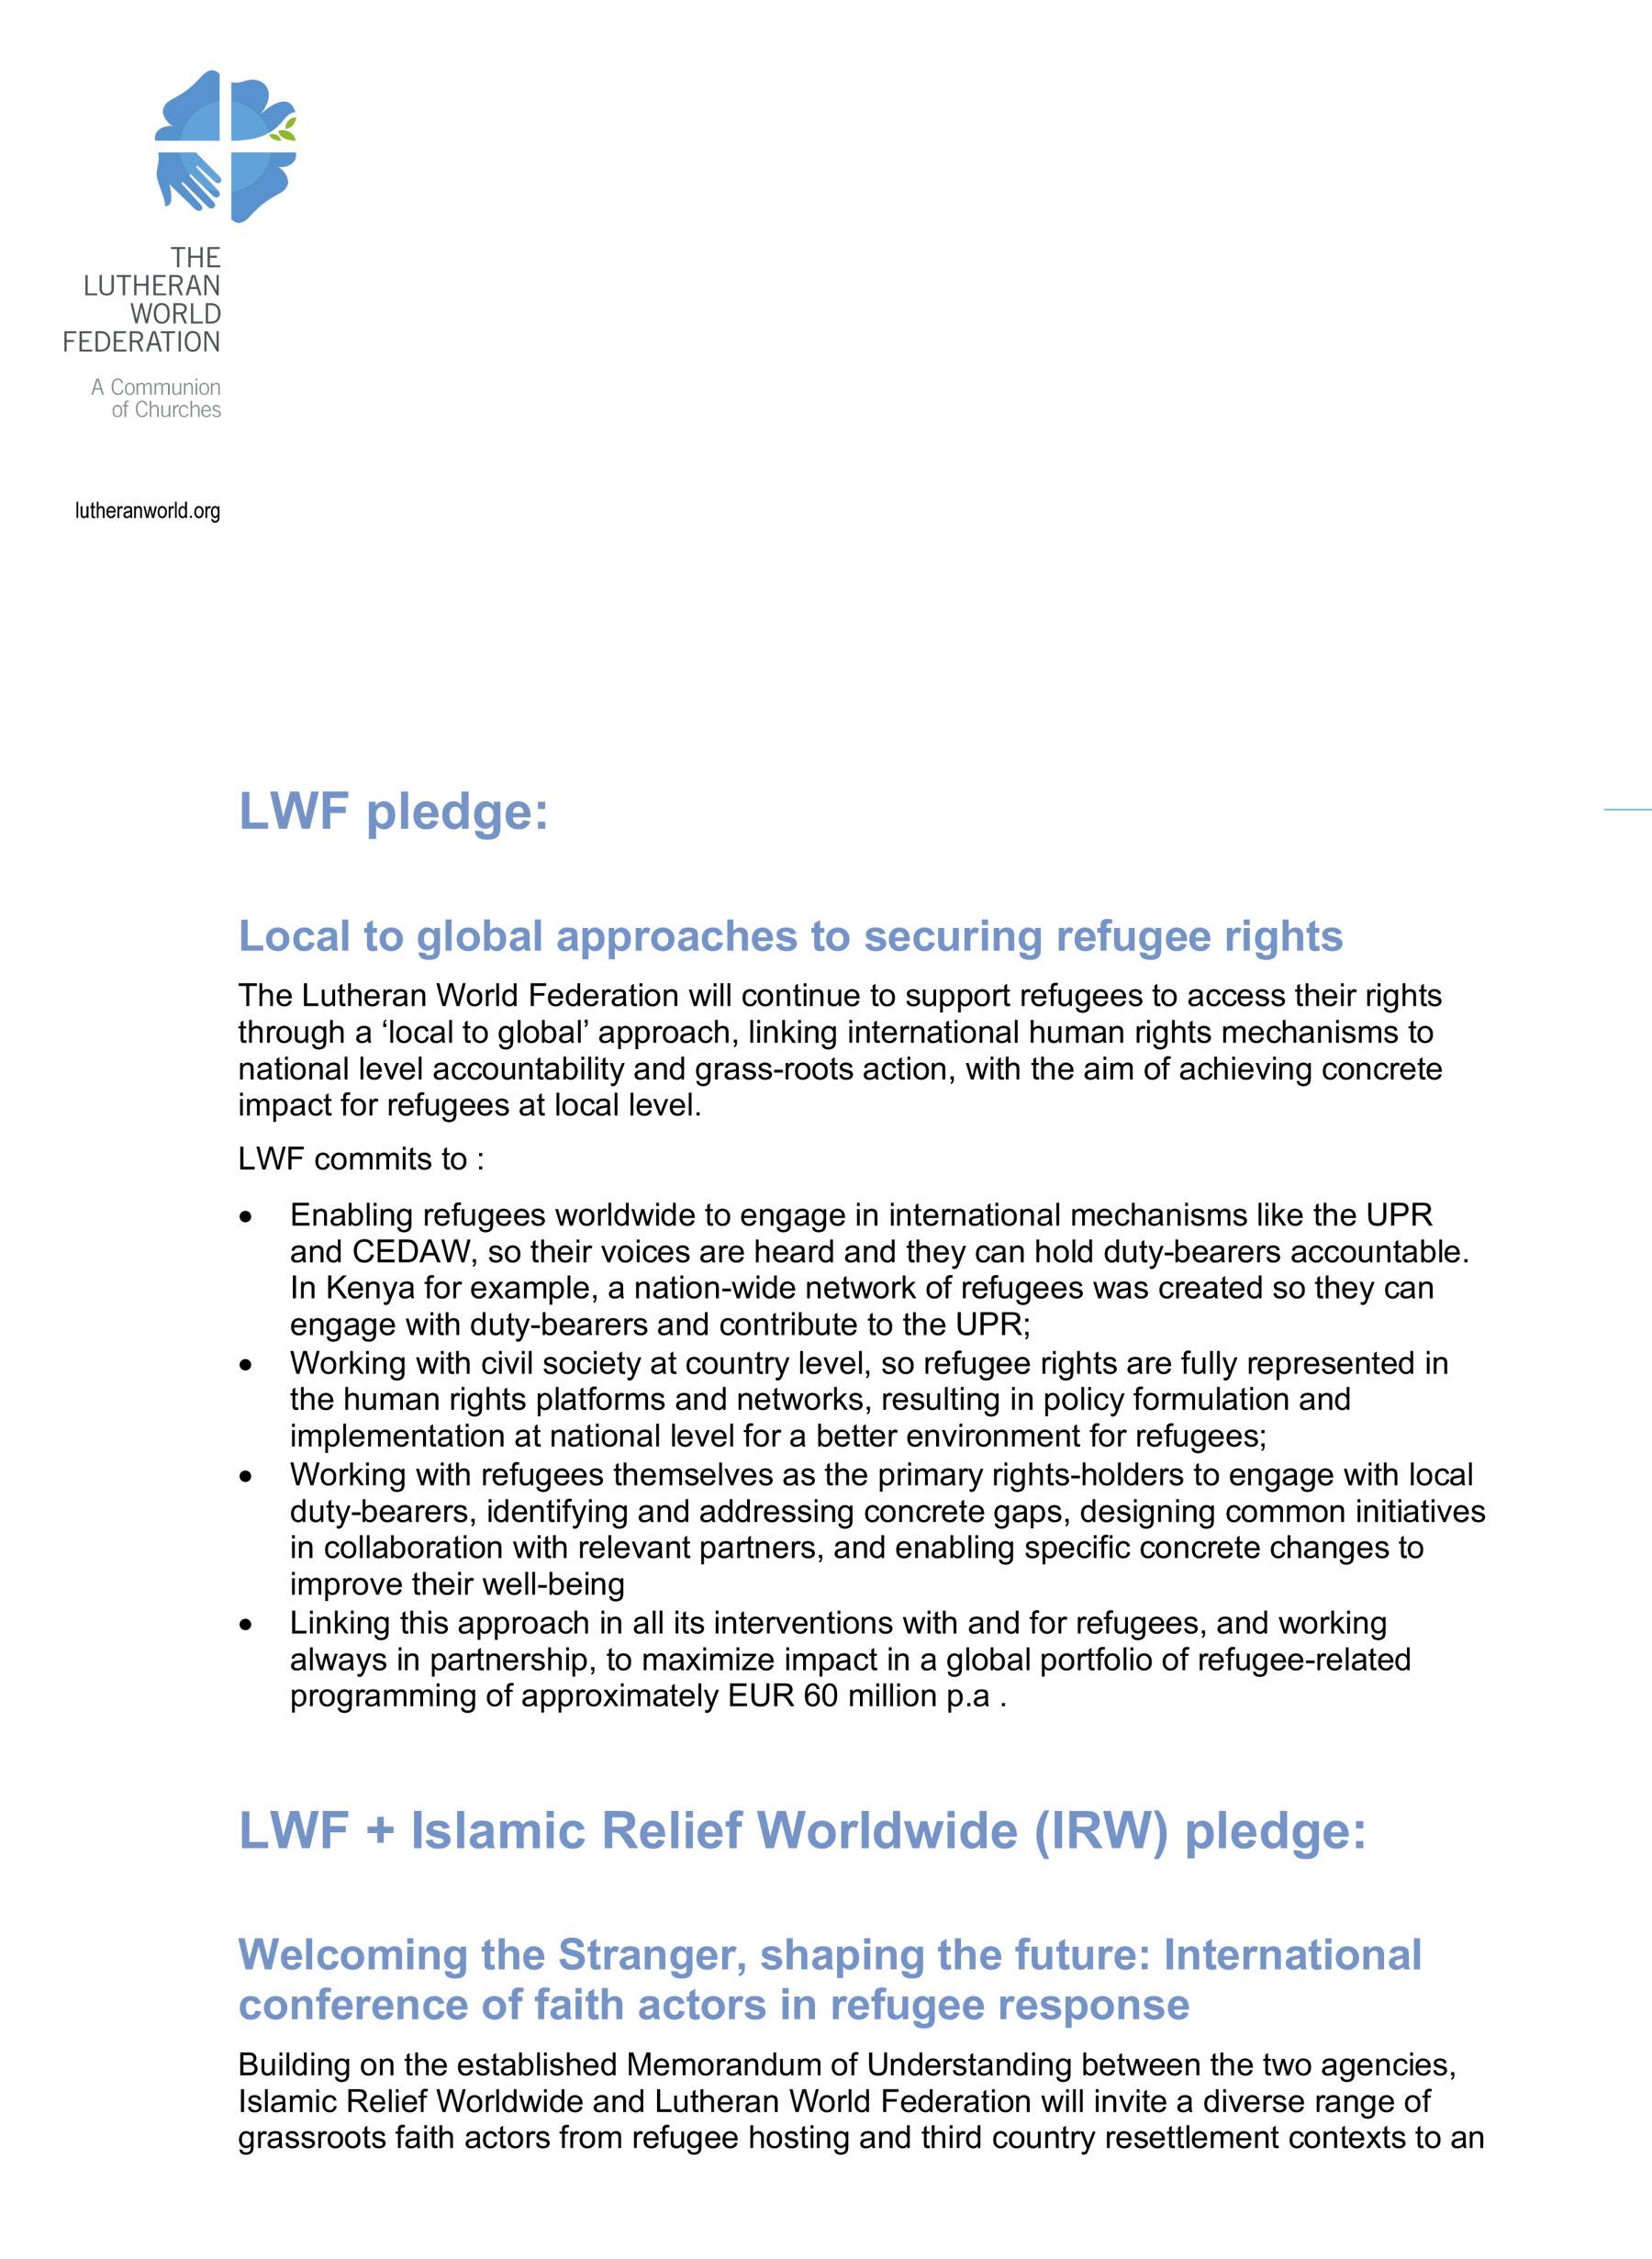 LWF pledges